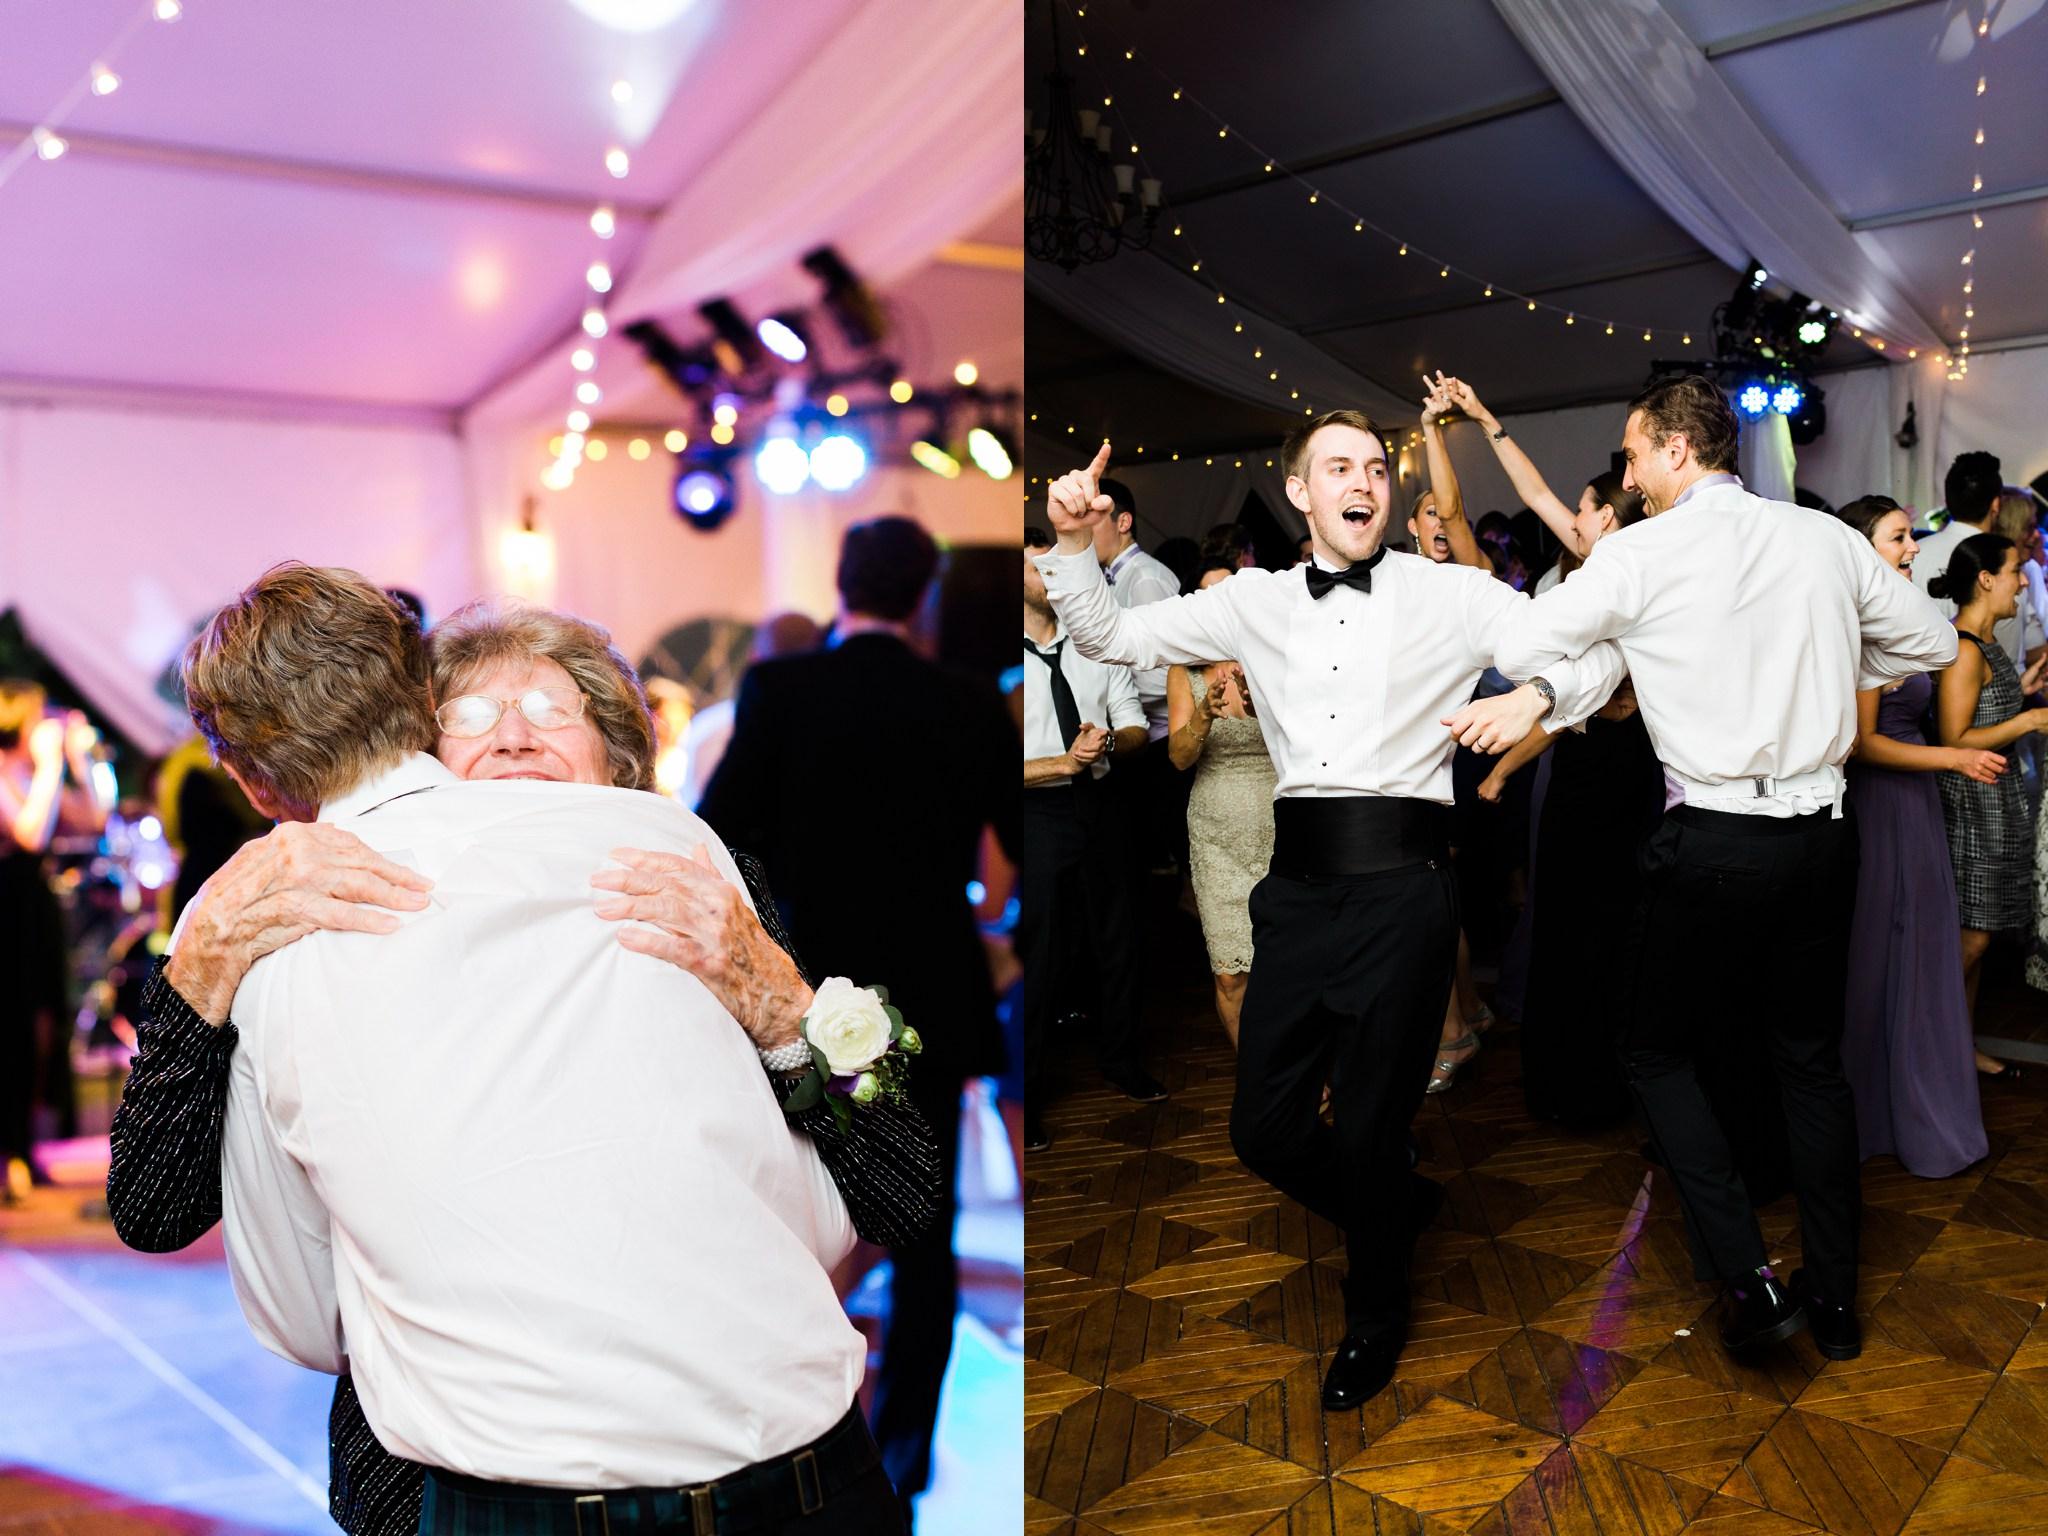 turner_hill_wedding_photos_00051.JPG